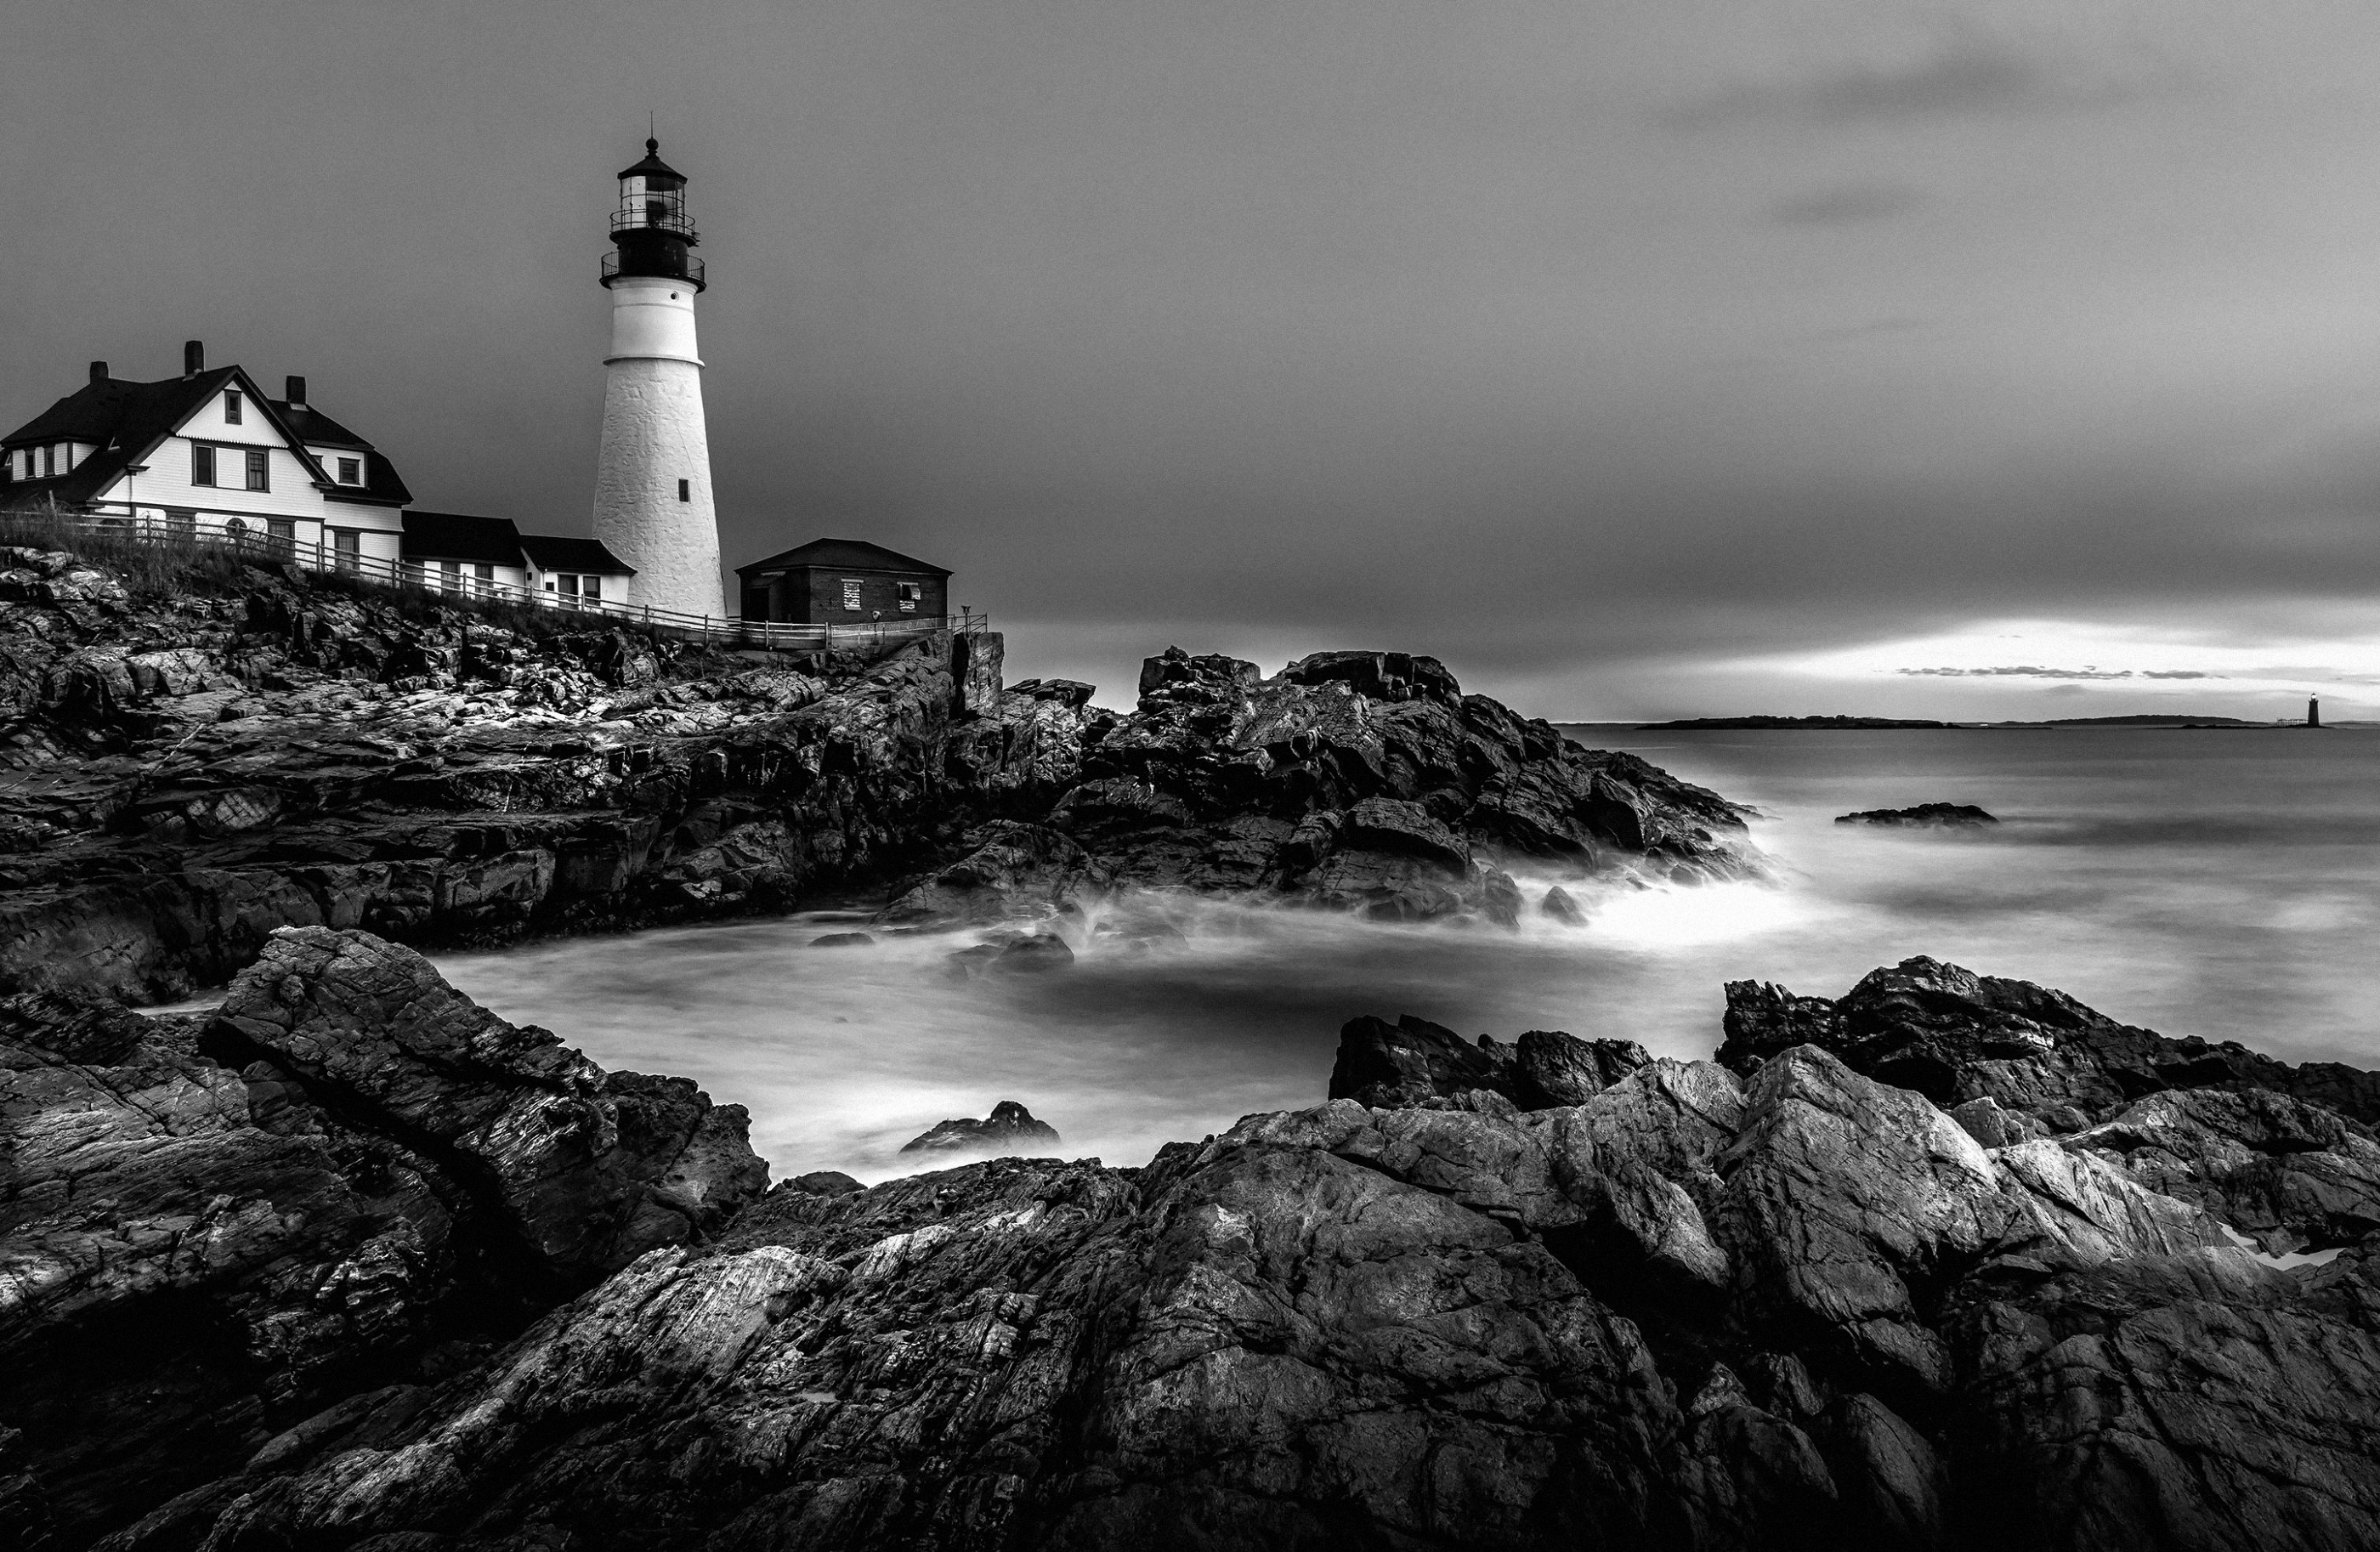 portland-head-lighthouse-sunrise-maine-ash-newell